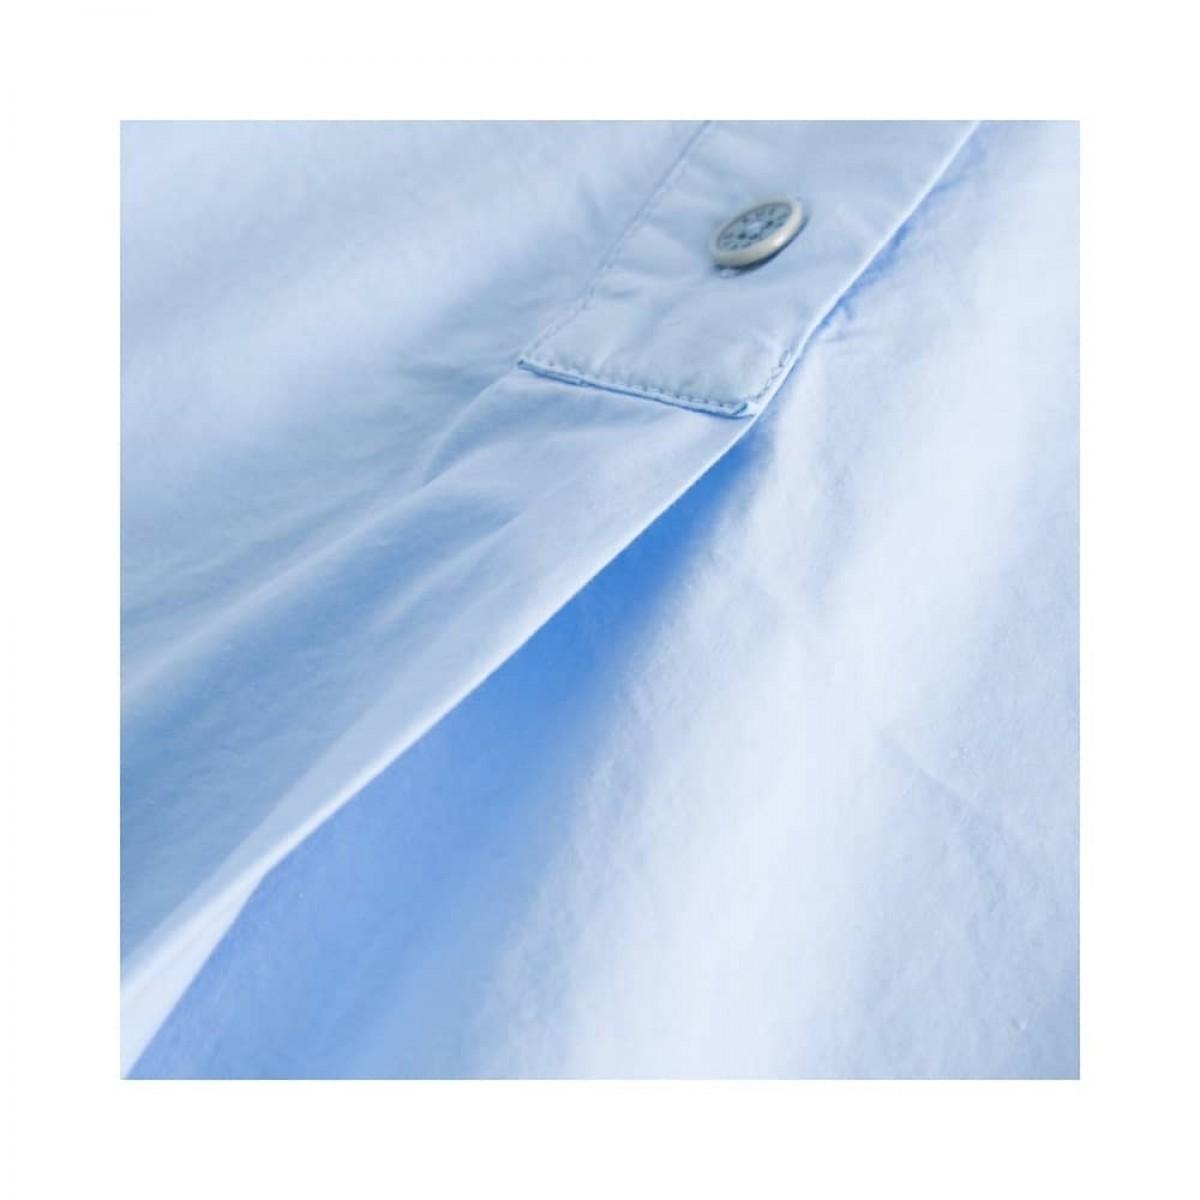 shiloh skjorte - light blue - læg detalje